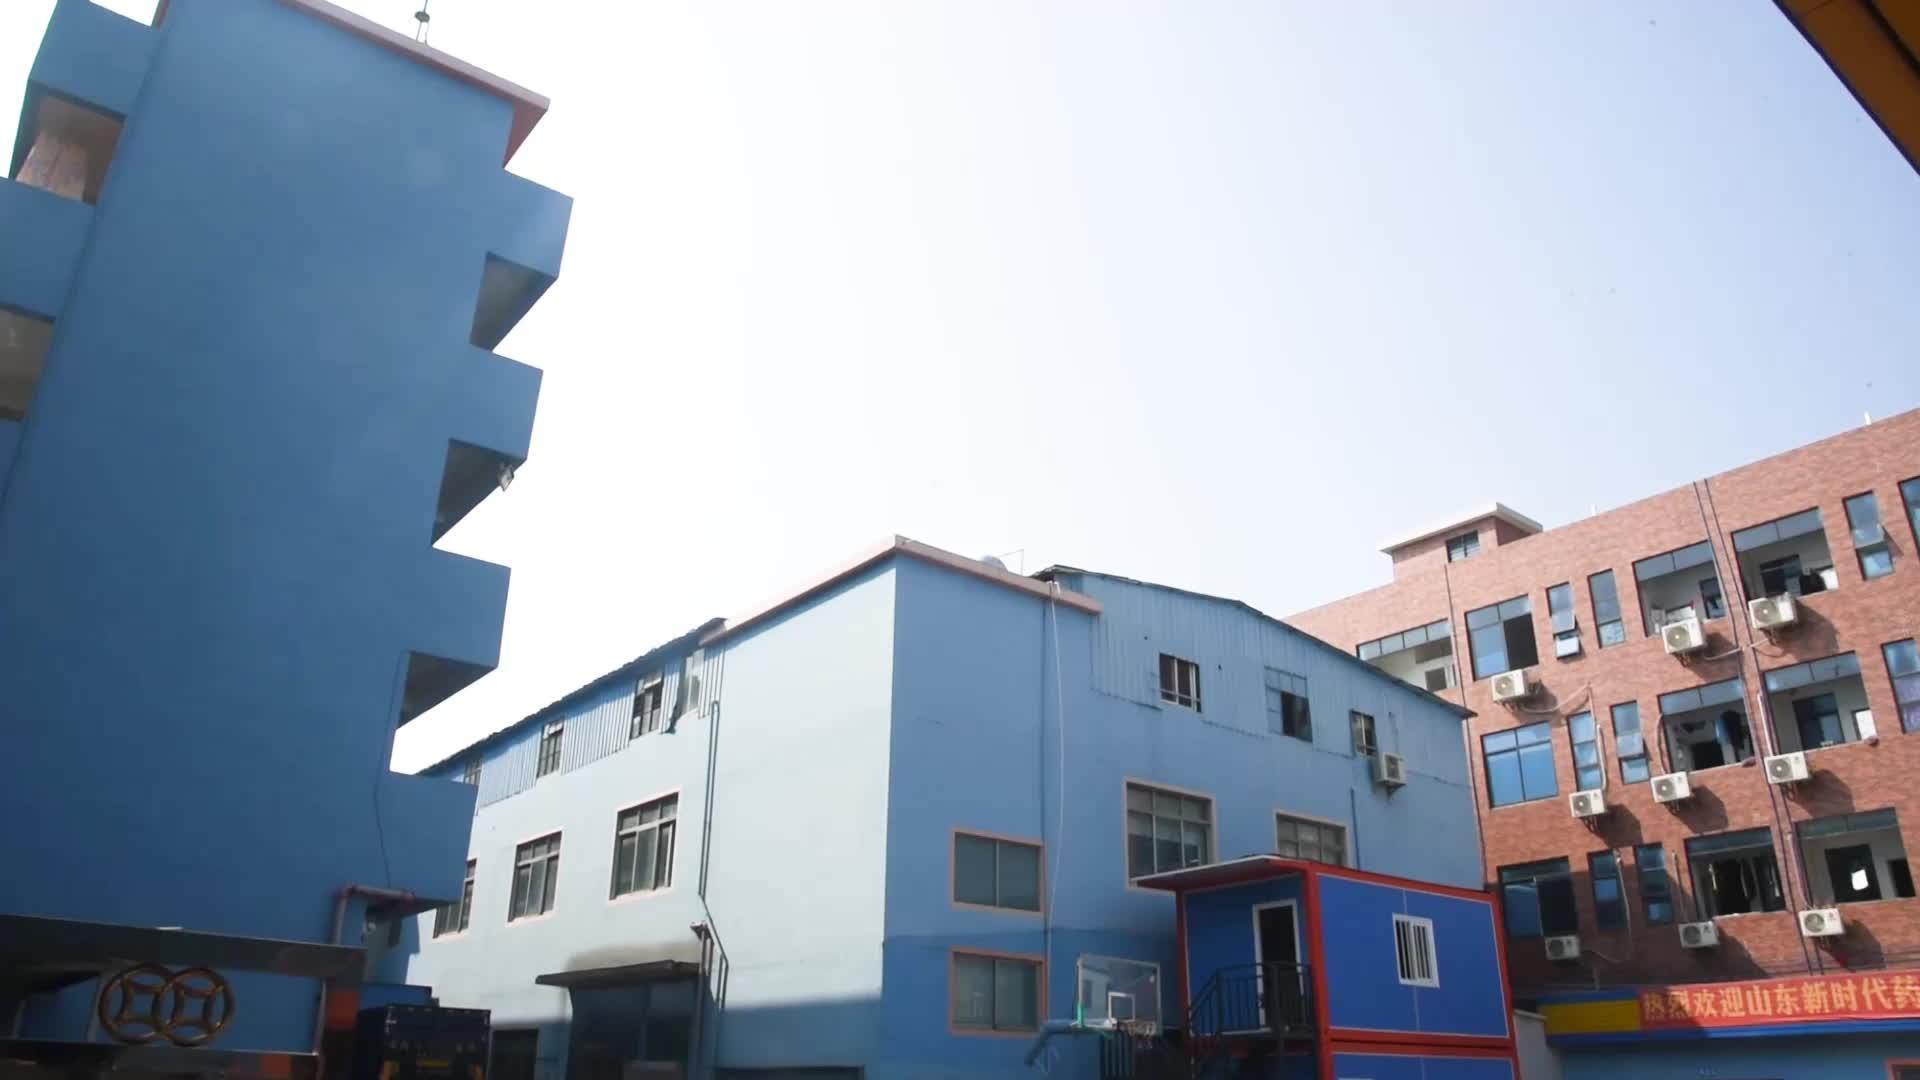 Baolin 제조 공급 100% 순수 티 트리 에센셜 오일 탑 차 나무 오일 대량